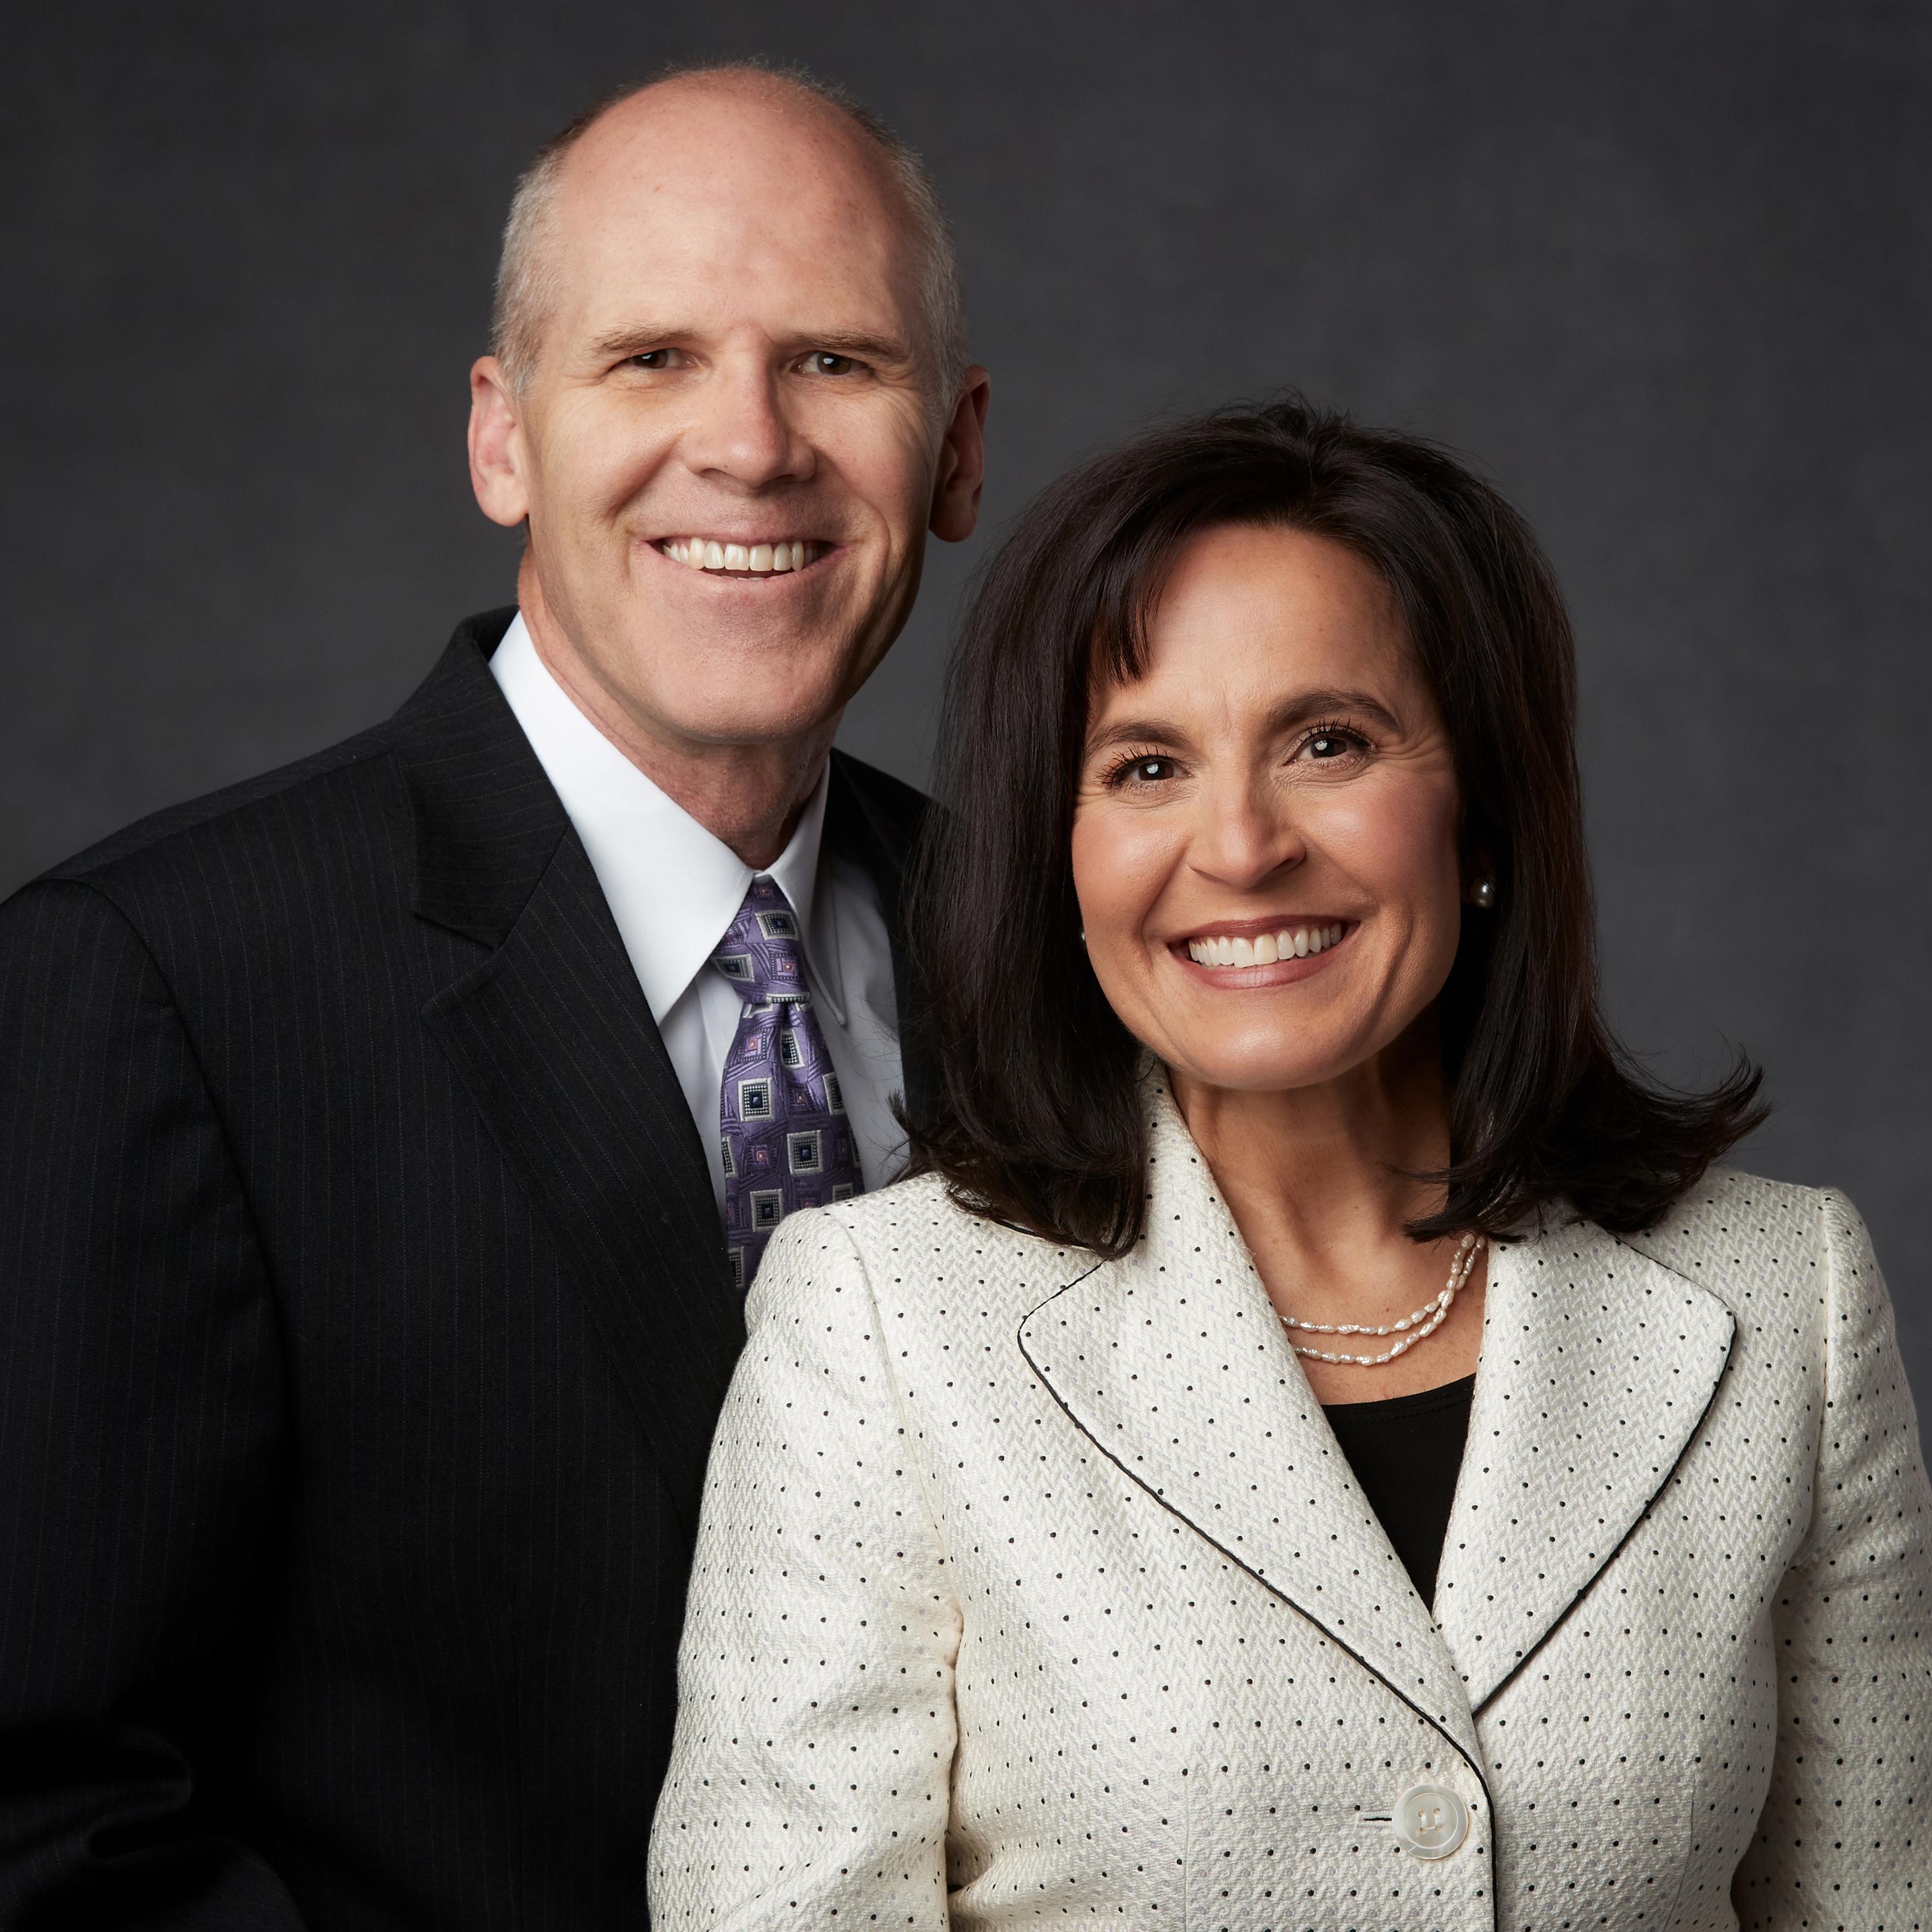 Todd M. and Noelle Hammond